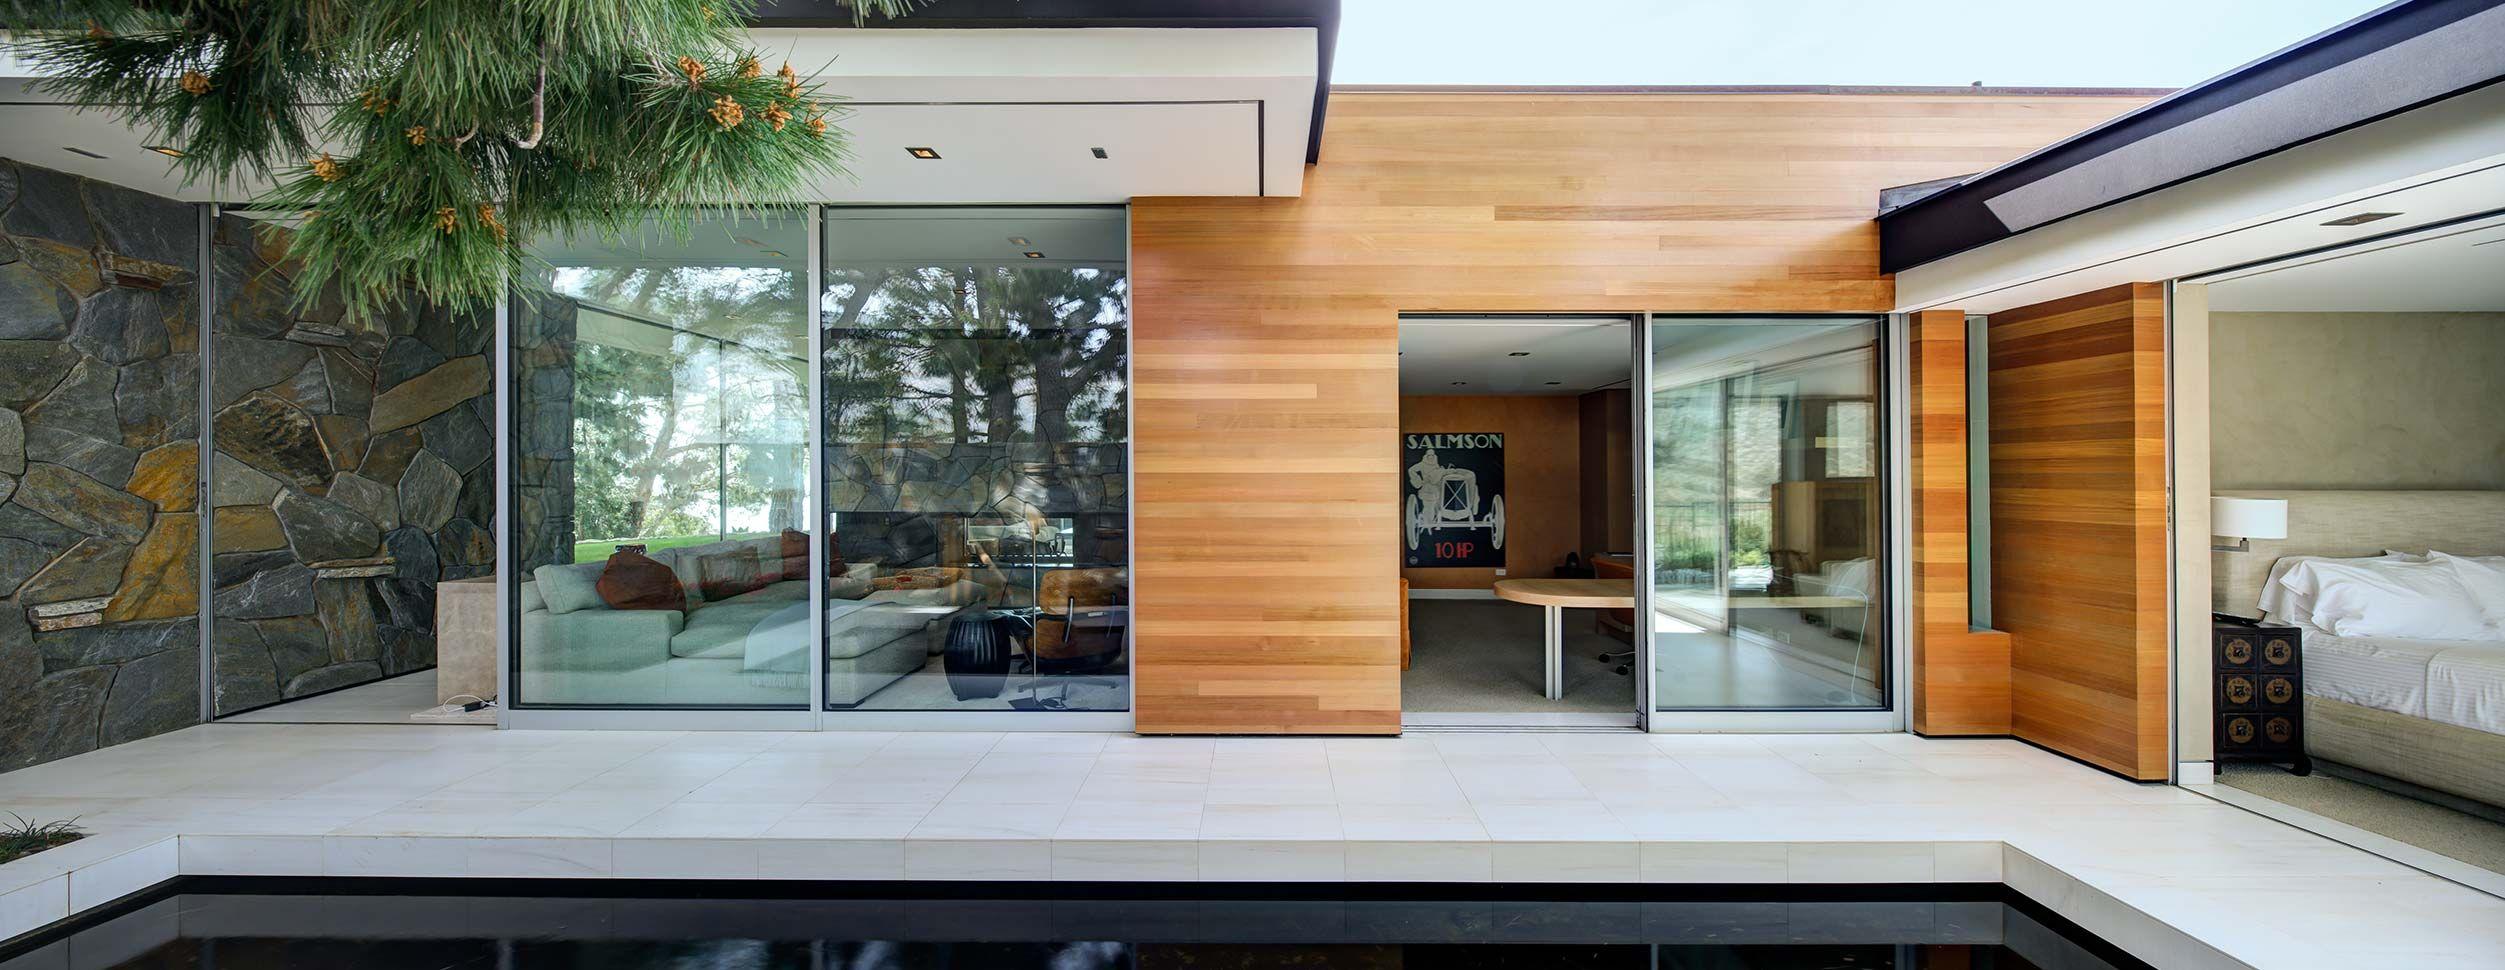 Mid Century Modern In Malibu Residential Galleries La Jolla Houses Residential Backyard Studio